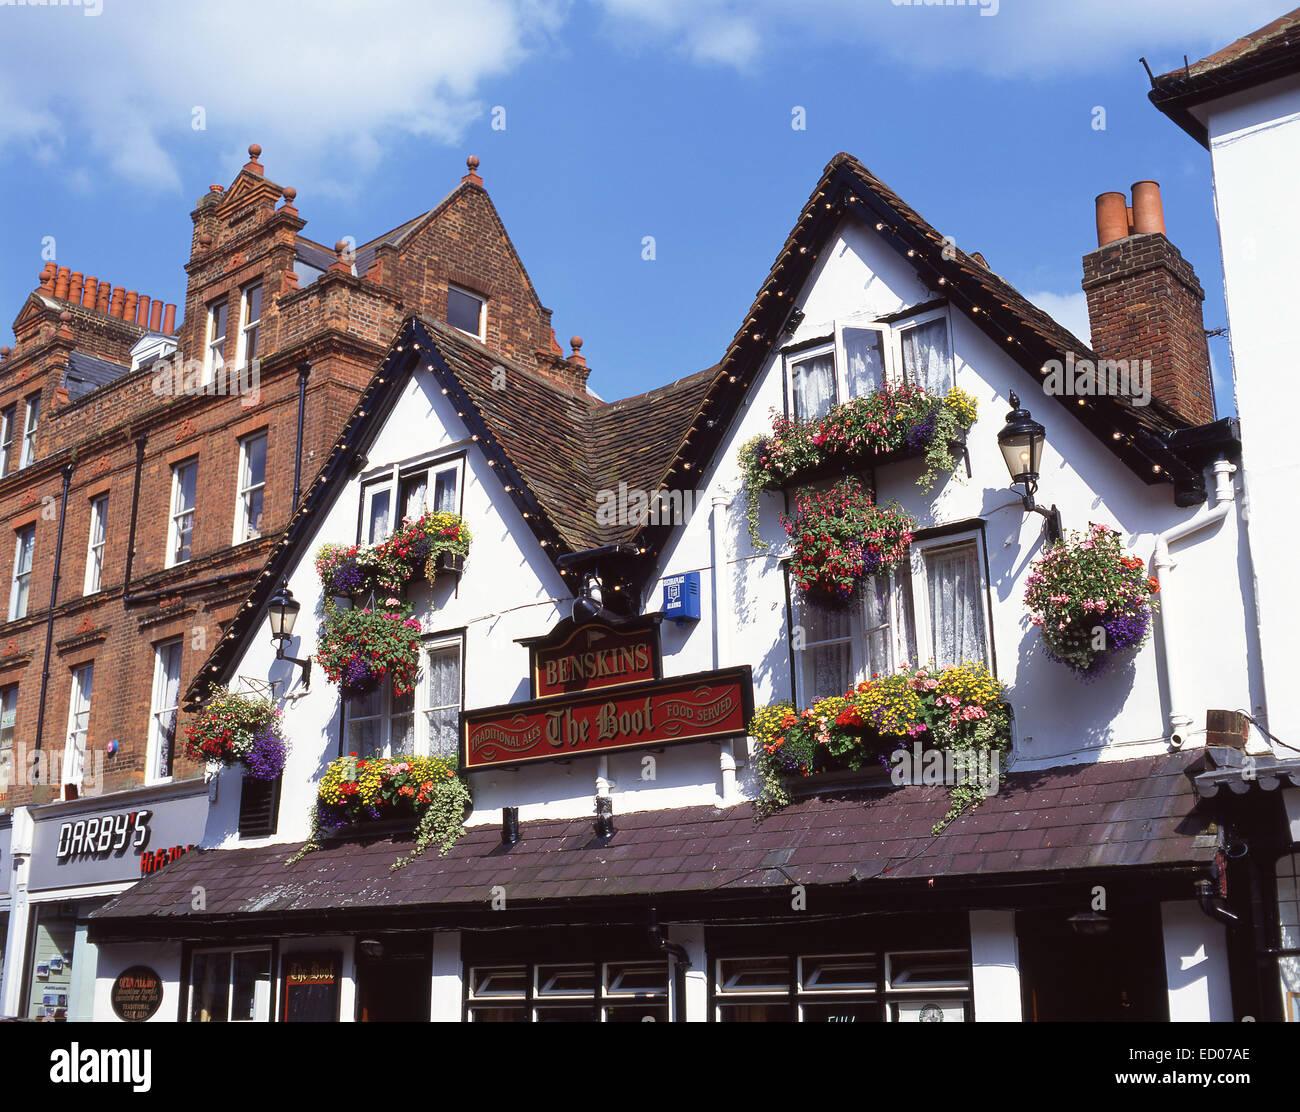 Arranque del siglo XV, el Pub, Market Place, St.Albans, Hertfordshire, Inglaterra, Reino Unido Imagen De Stock